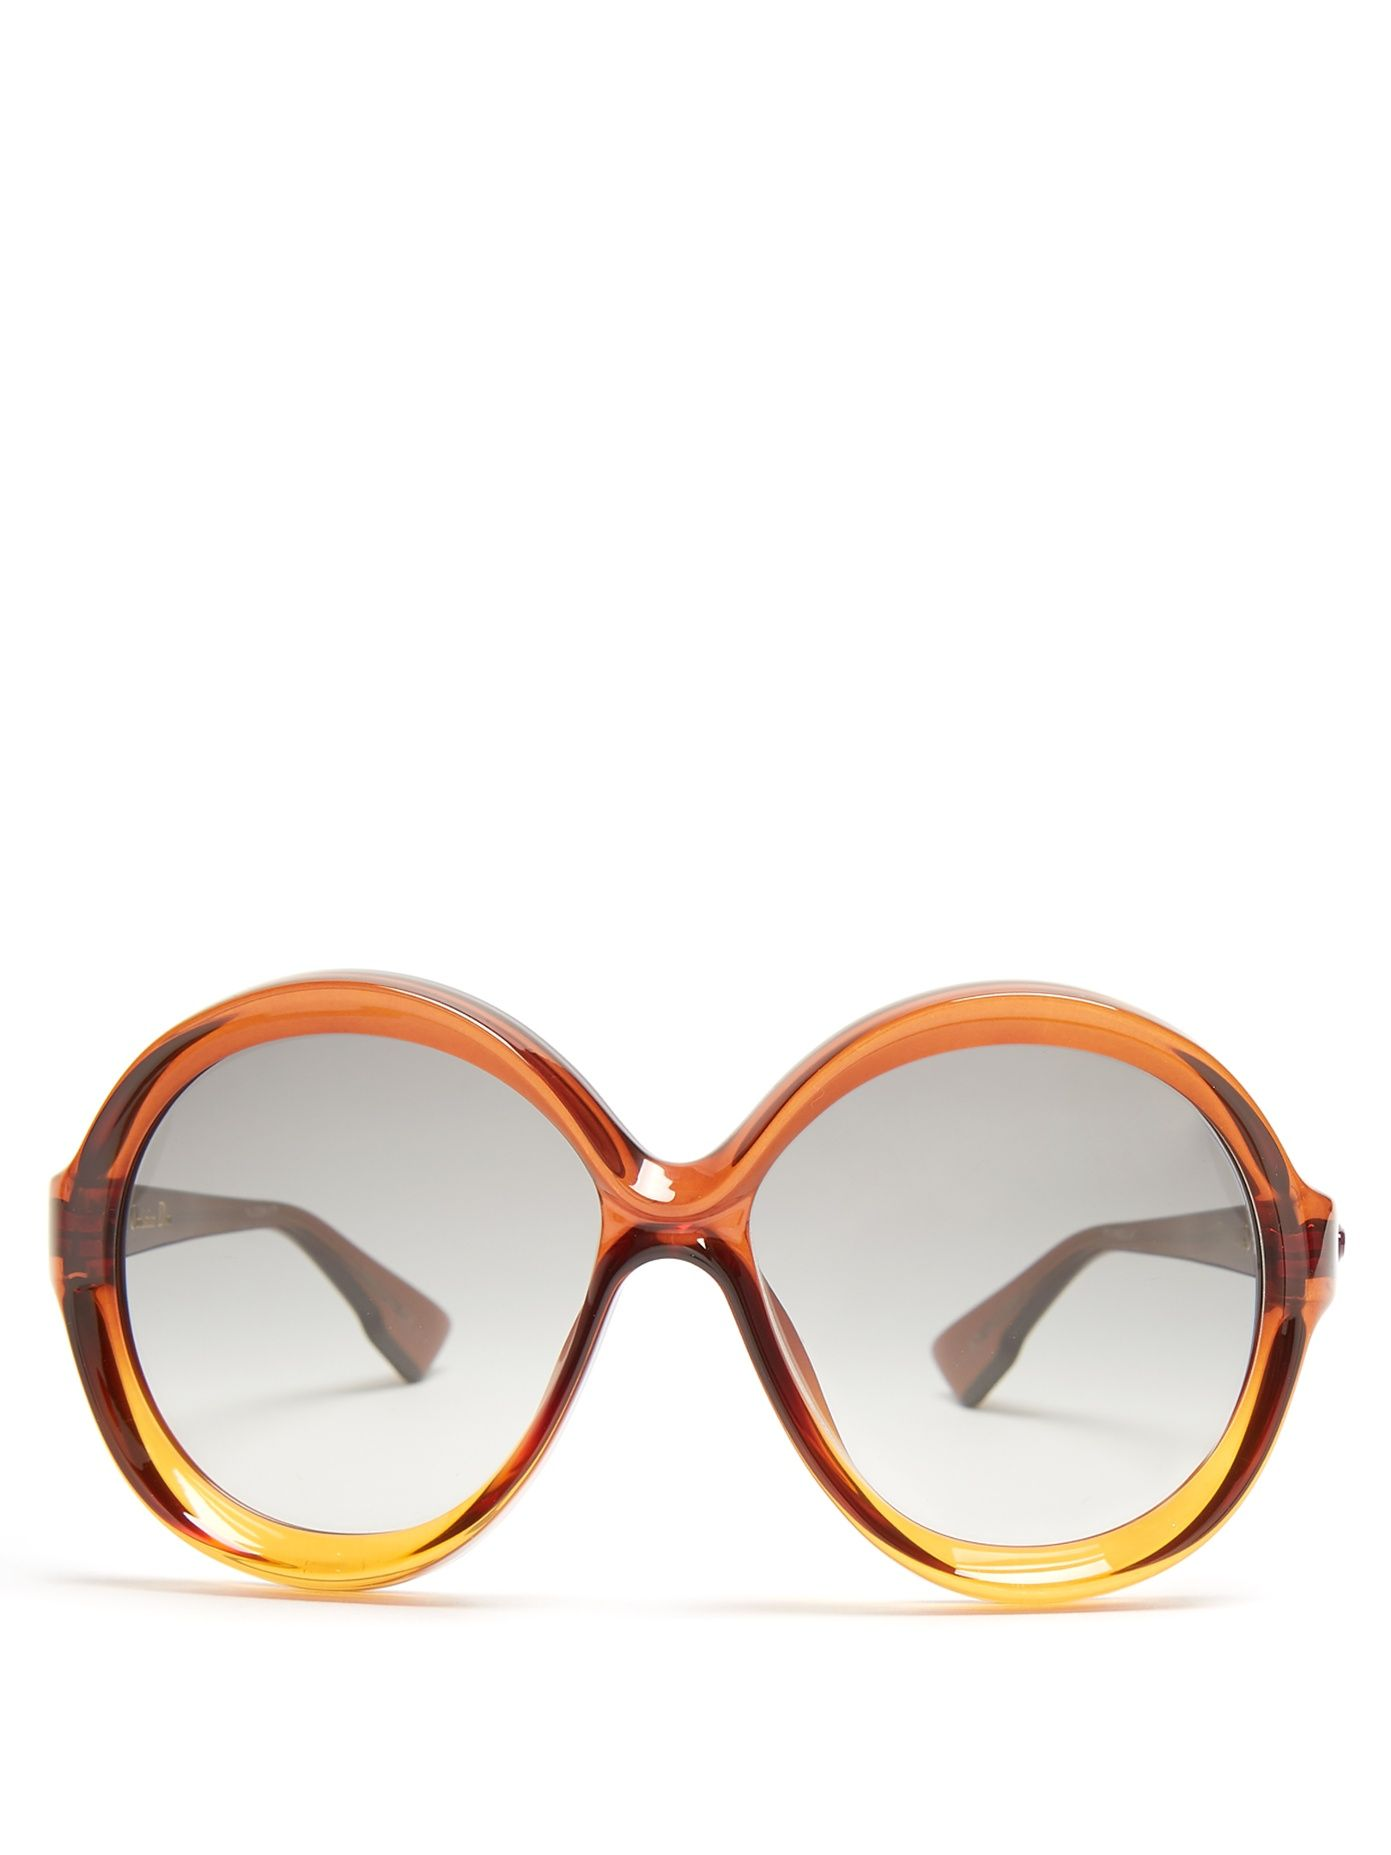 1ba1abba7b Dior Bianca round-frame sunglasses